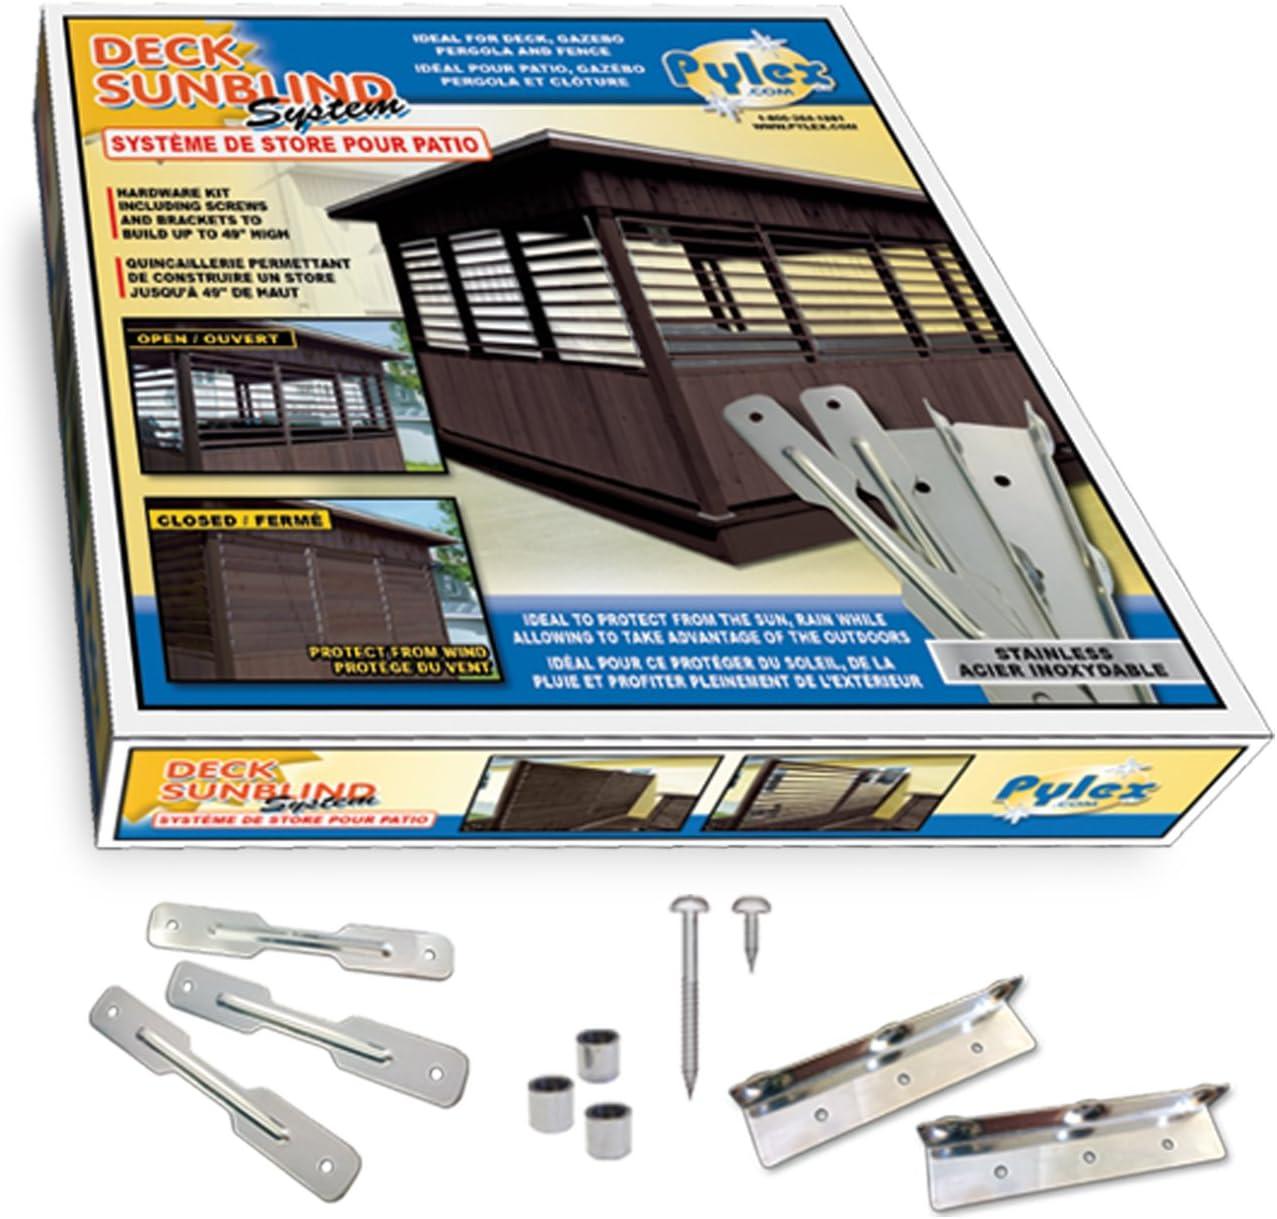 Pylex 11060 Deck Sunblind System Black